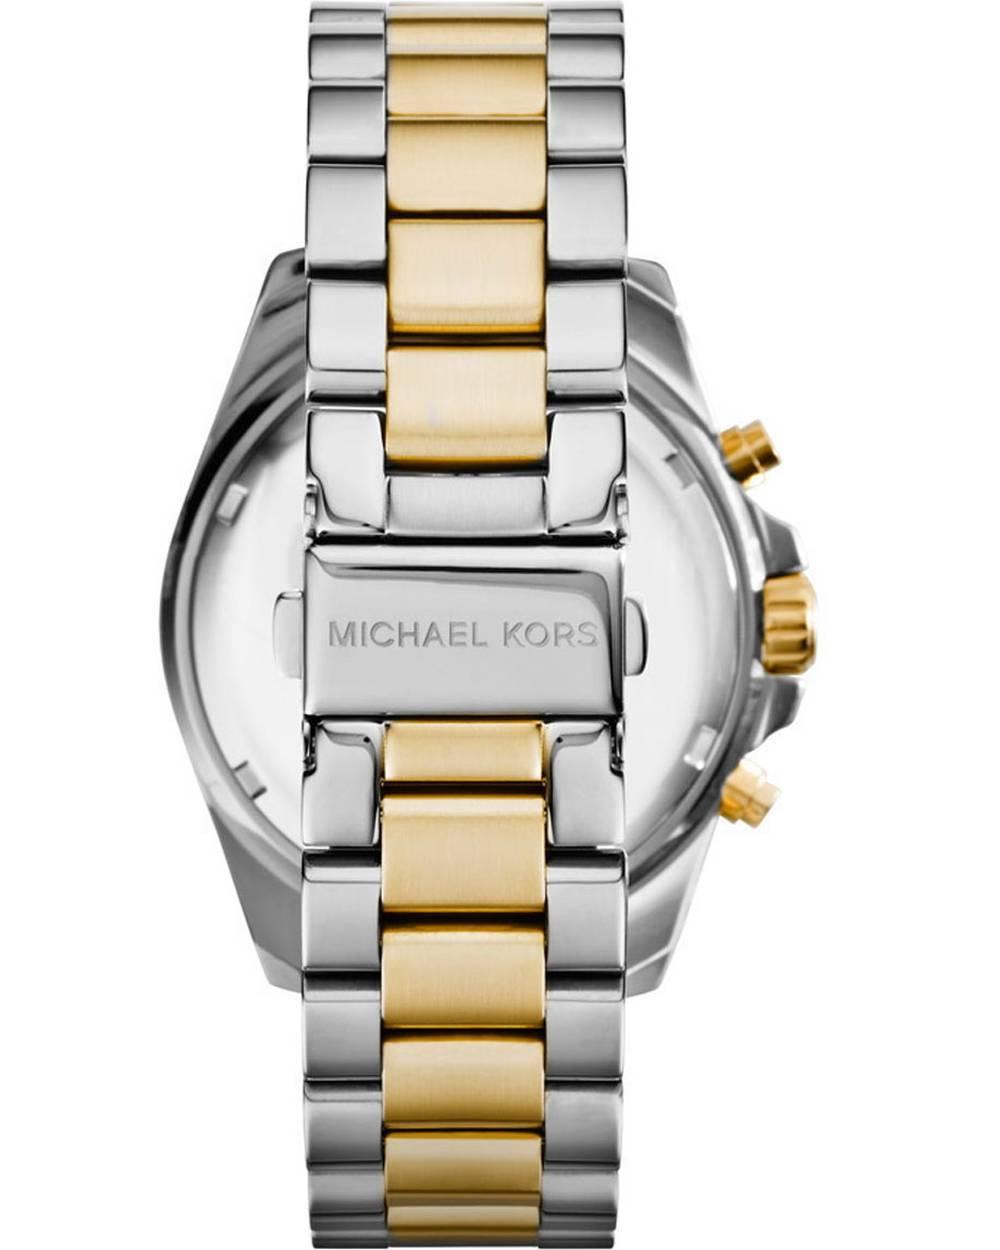 Michael Kors Bradshaw Two Tone Stainless Steel Bracelet MK5976 ebb8f9dbe6a